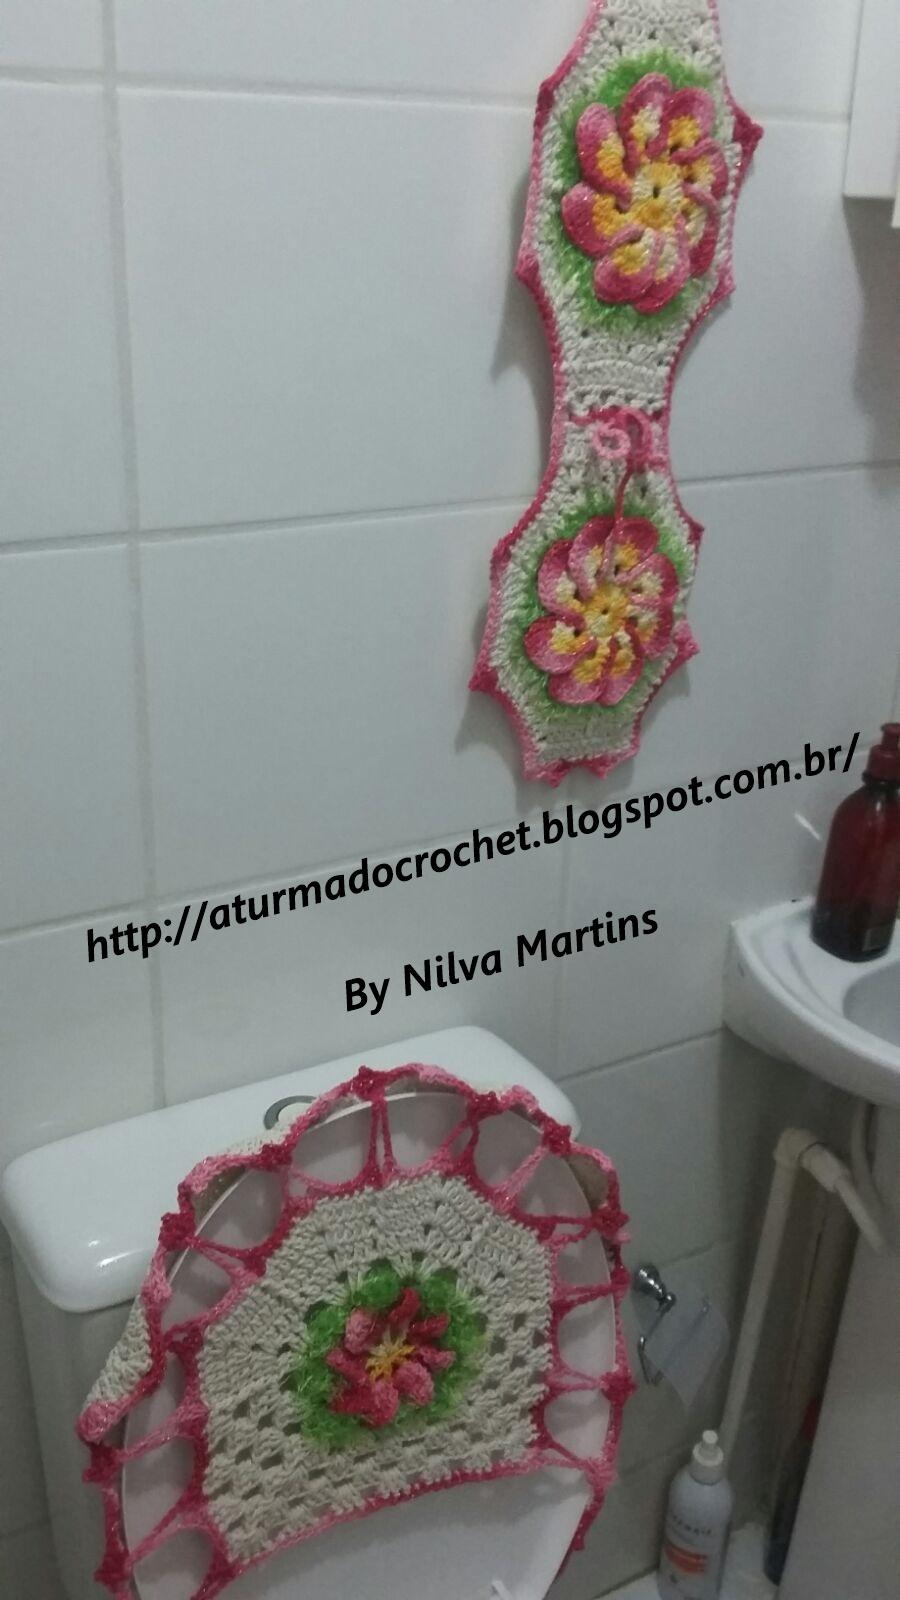 Jogos De Decorar Banheiros De Luxo : A turma do crochet jogo de banheiro luxo